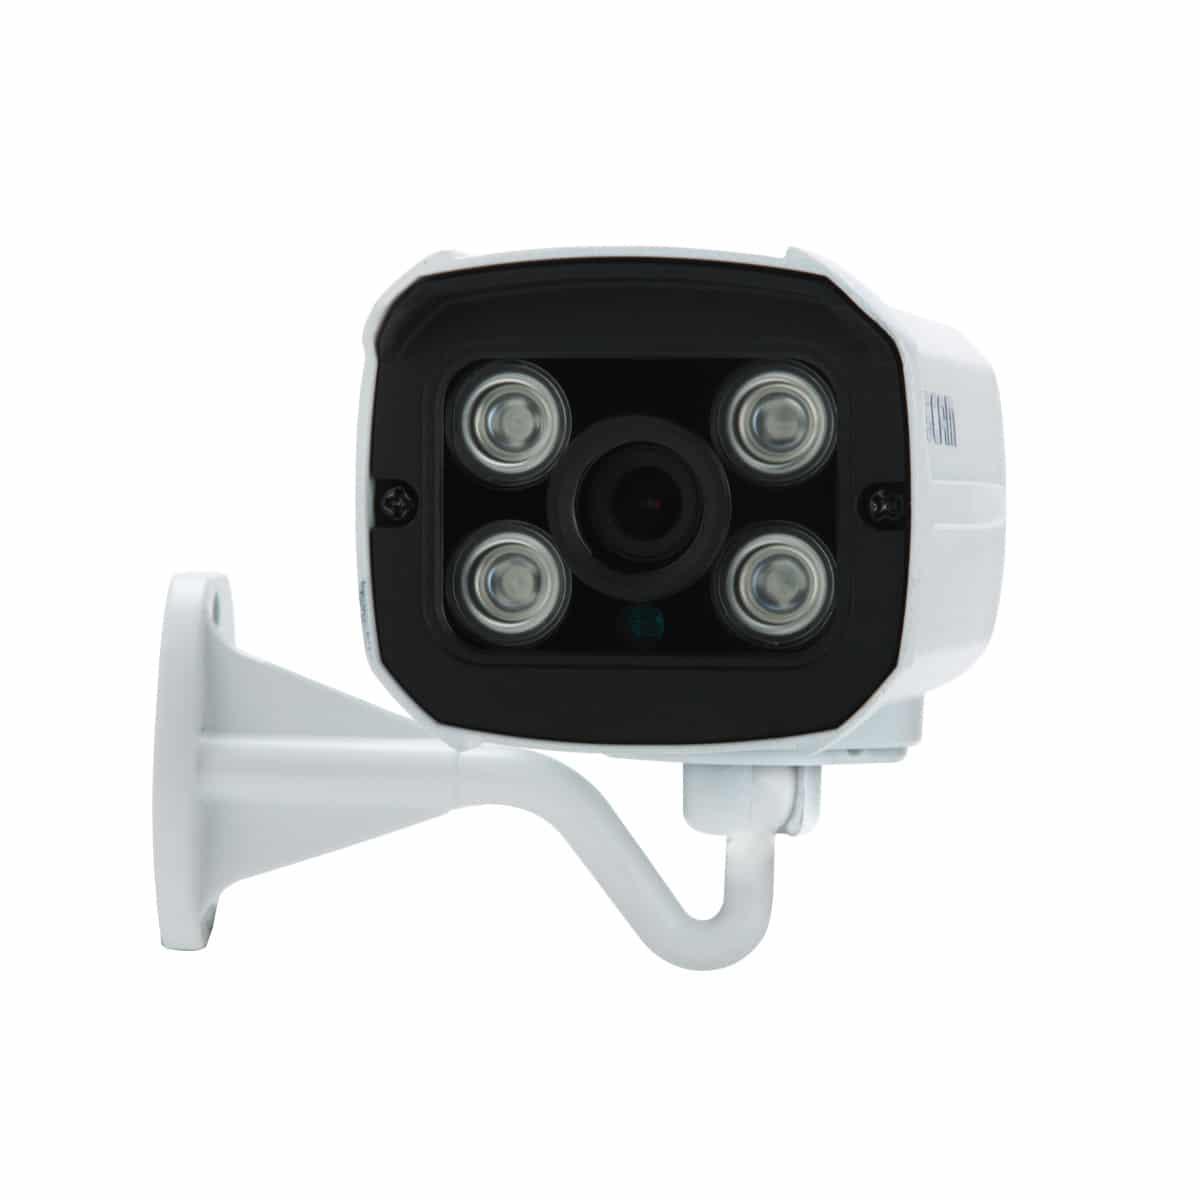 Escam Ip Camera QD300-05